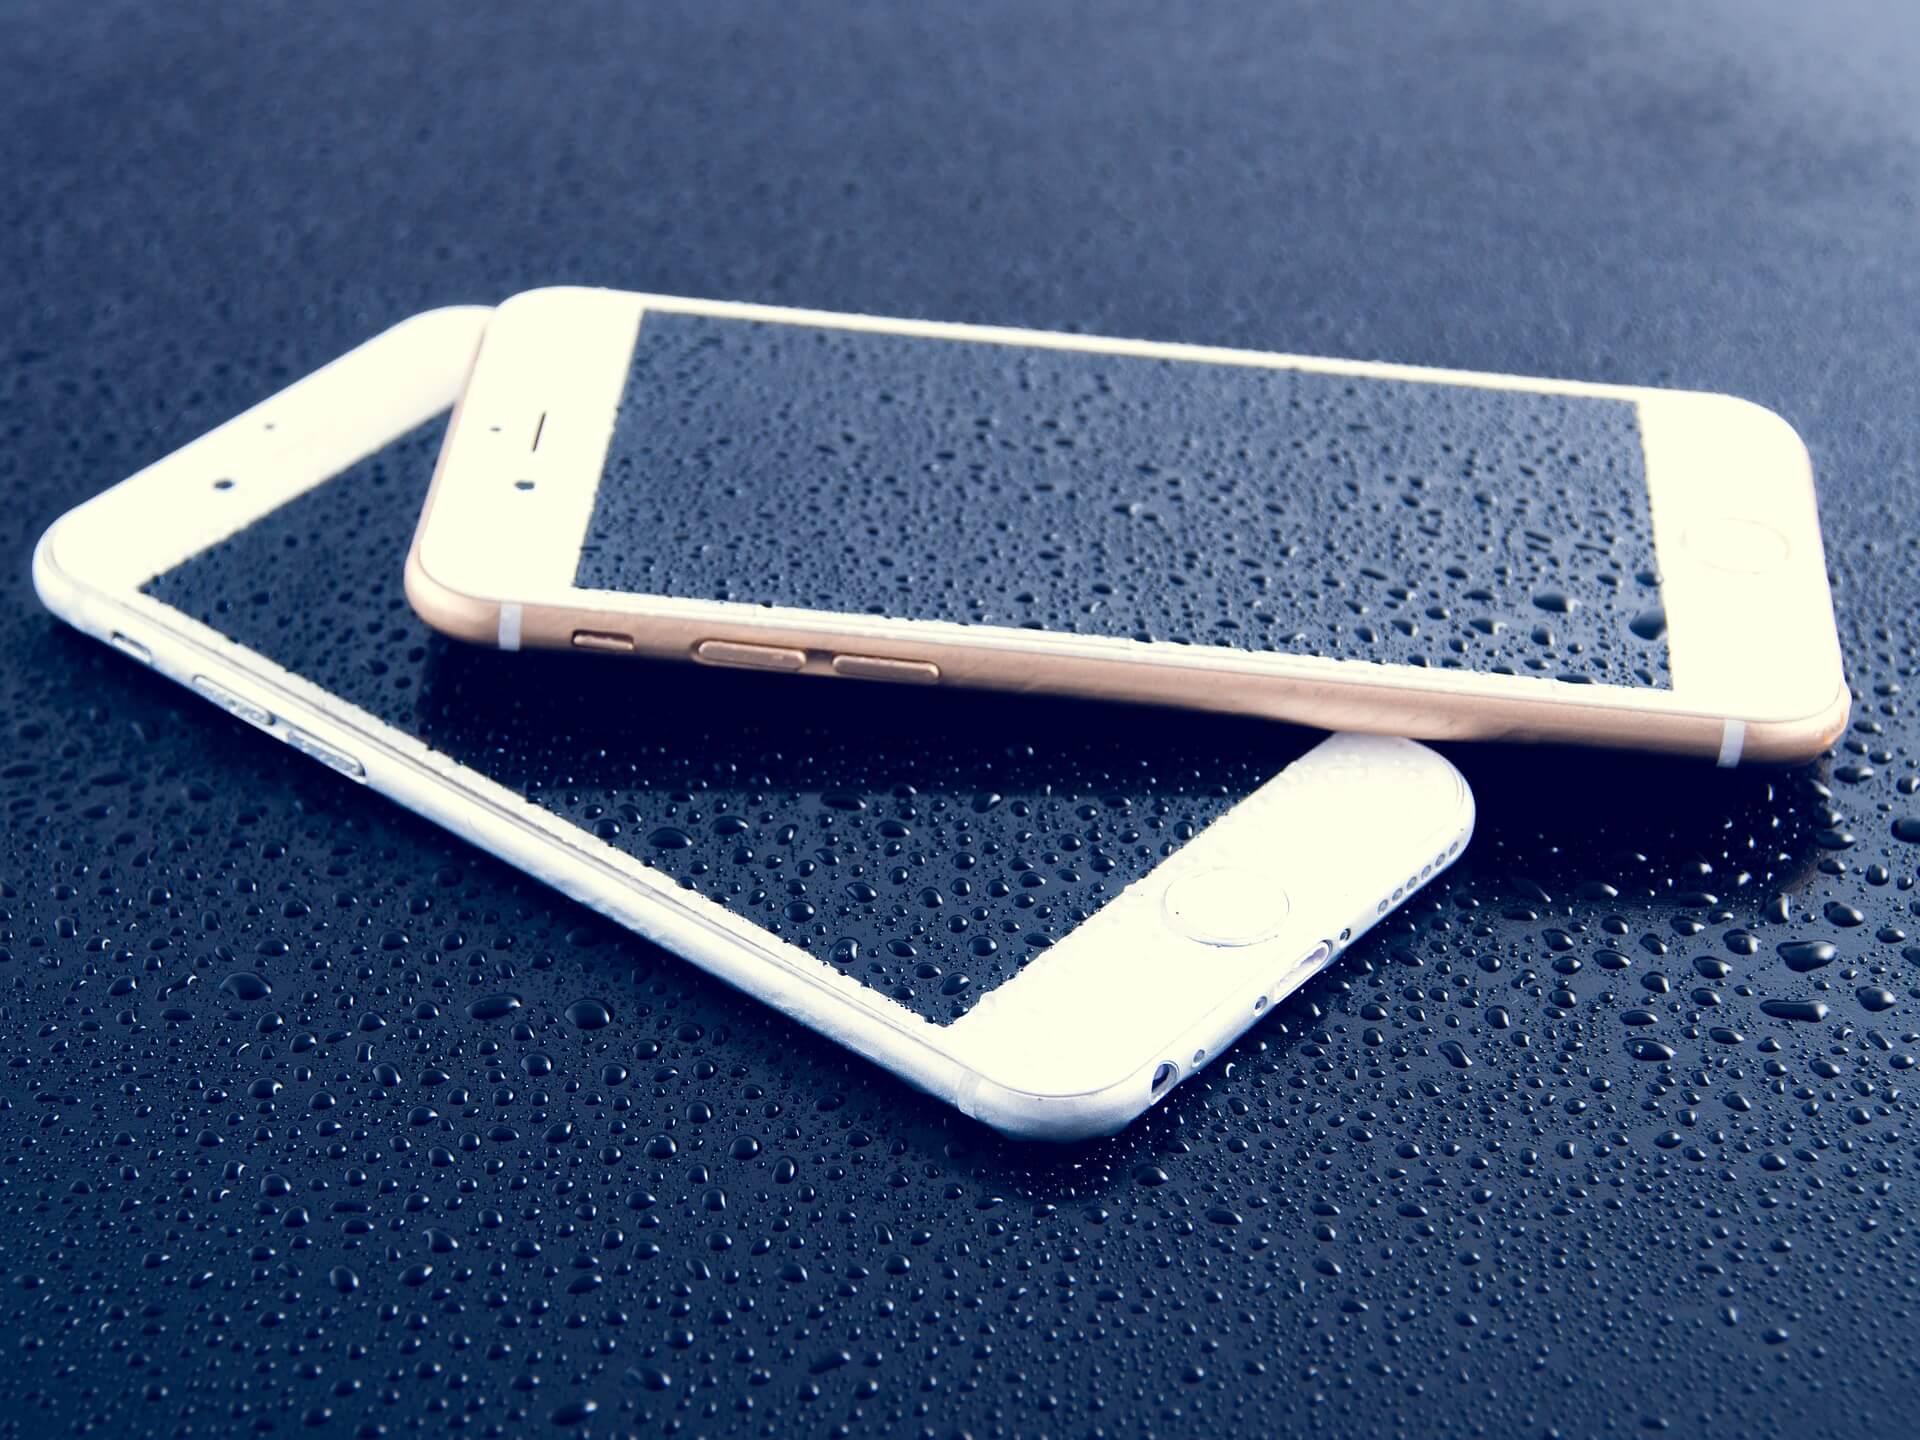 iphone-1067984_1920